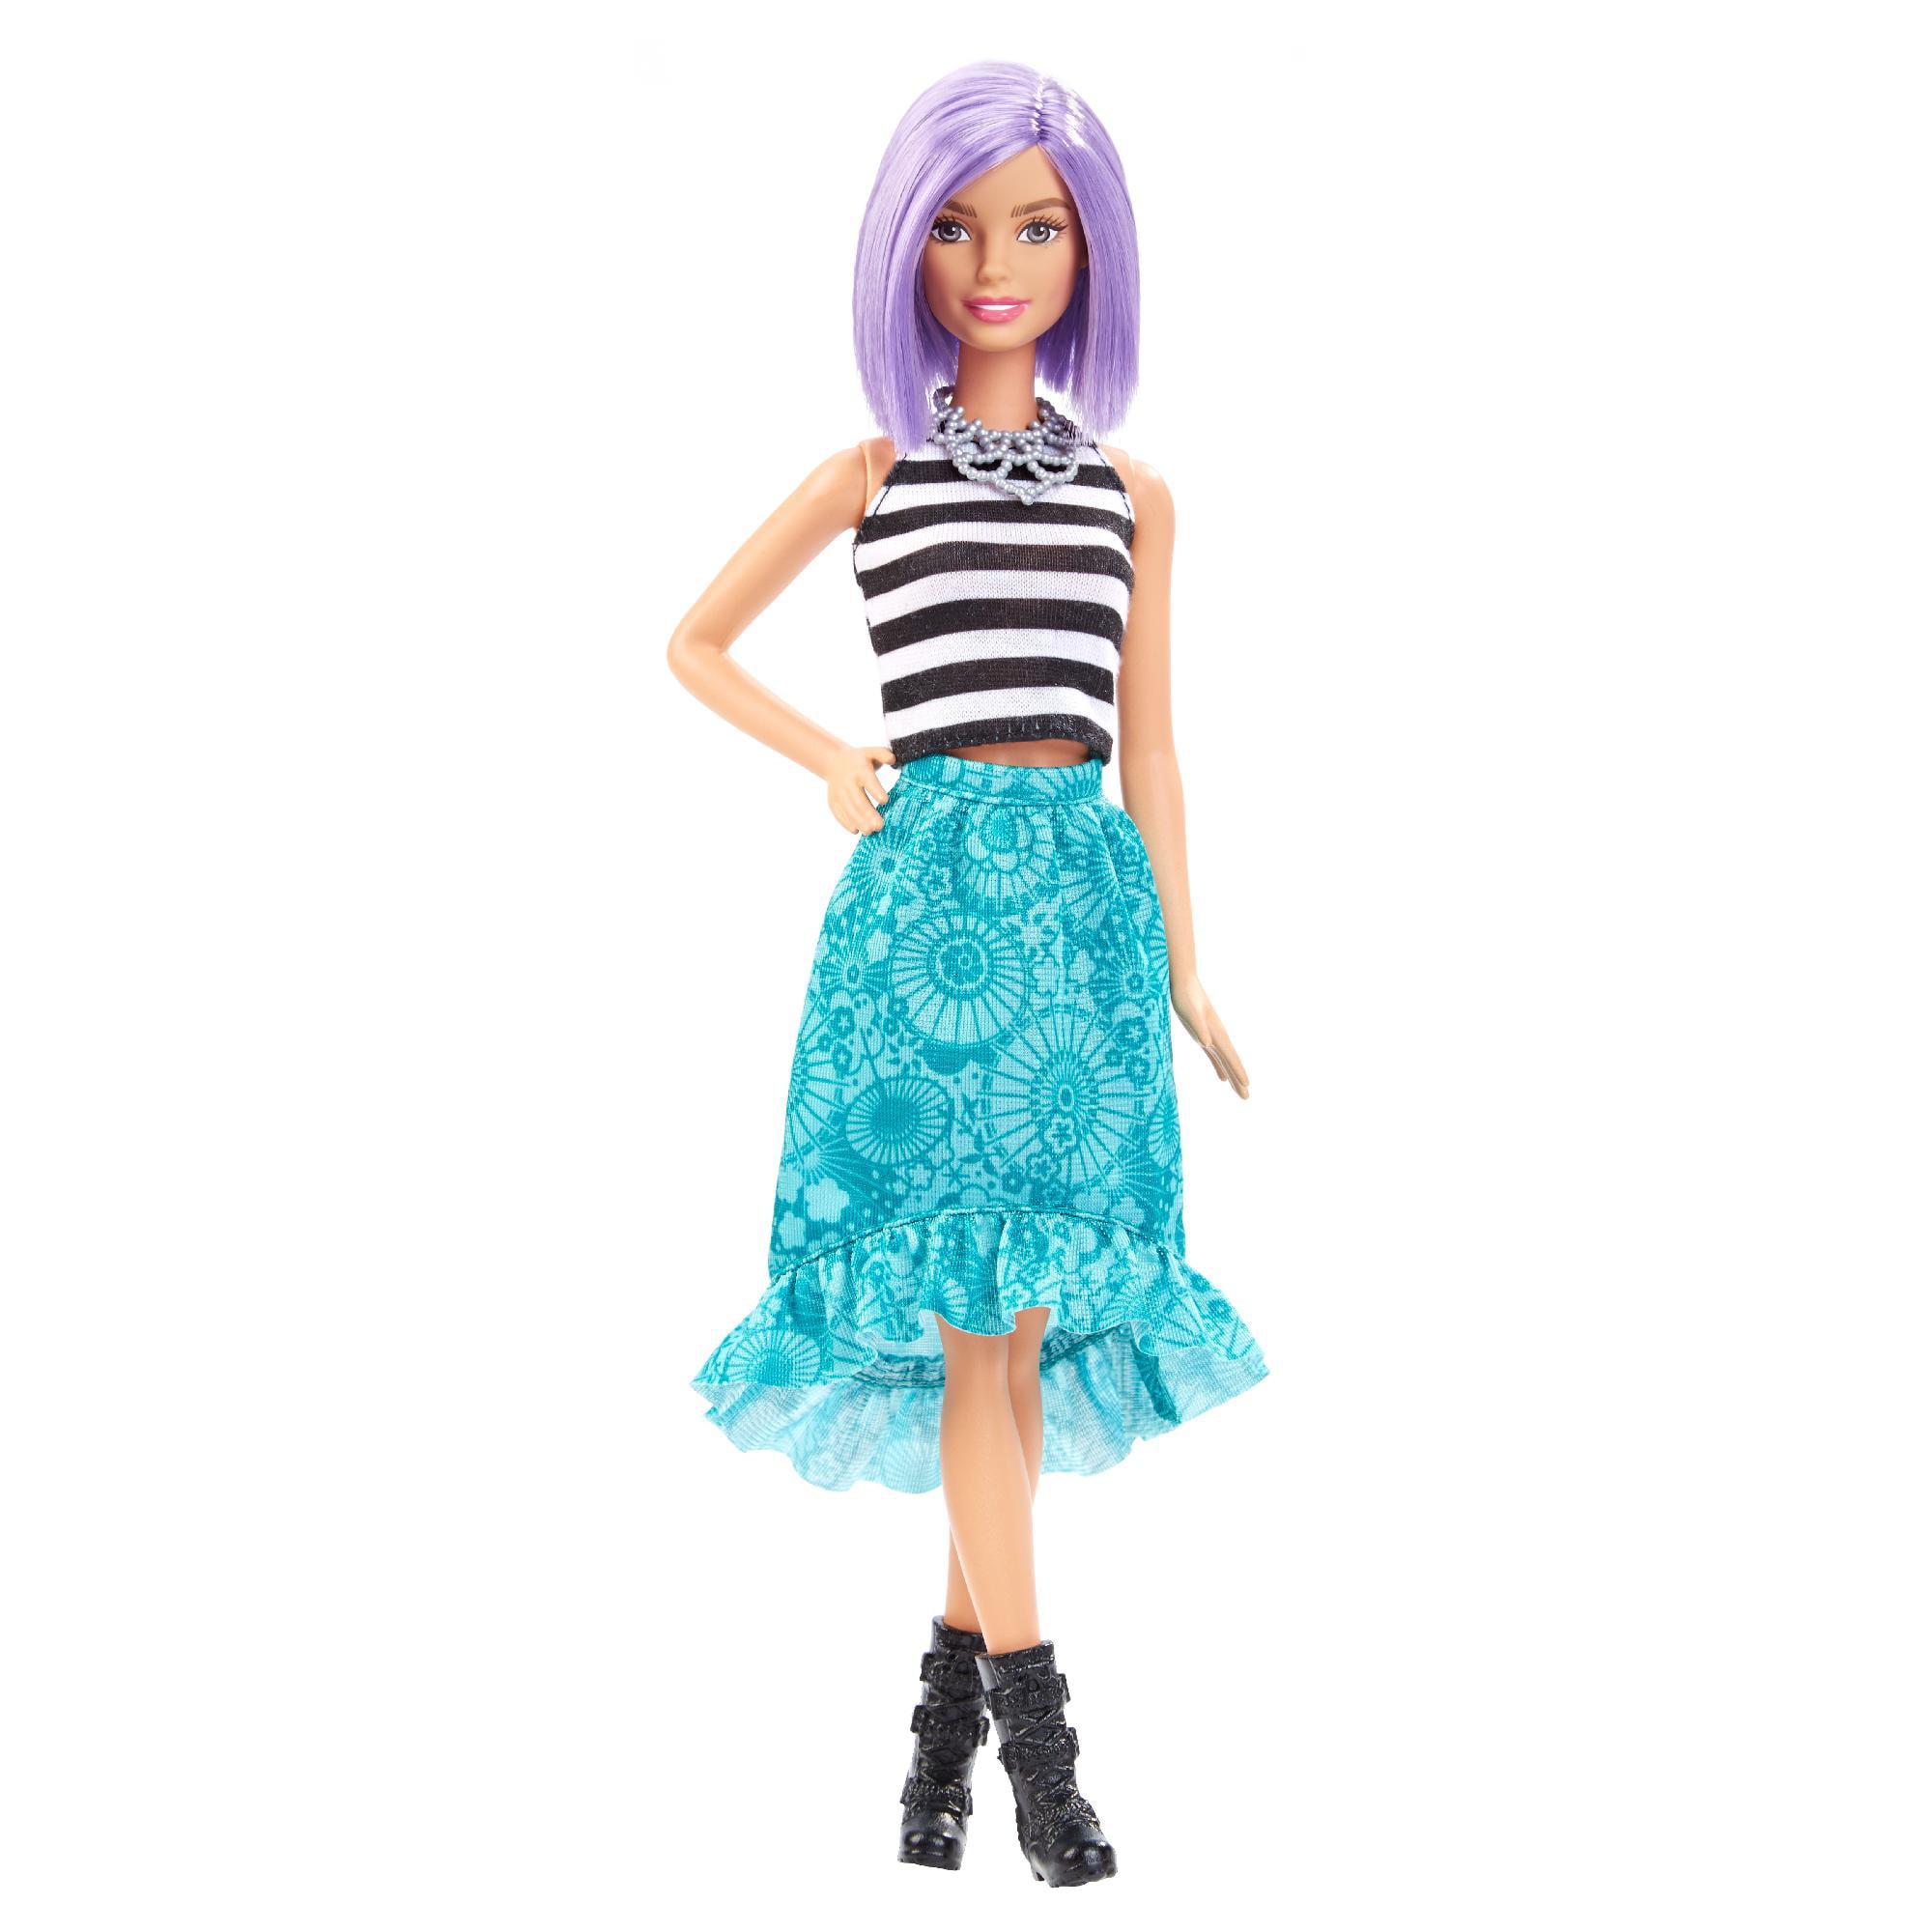 Barbie Fashionistas Doll Va va violet Original Body Violet Hair